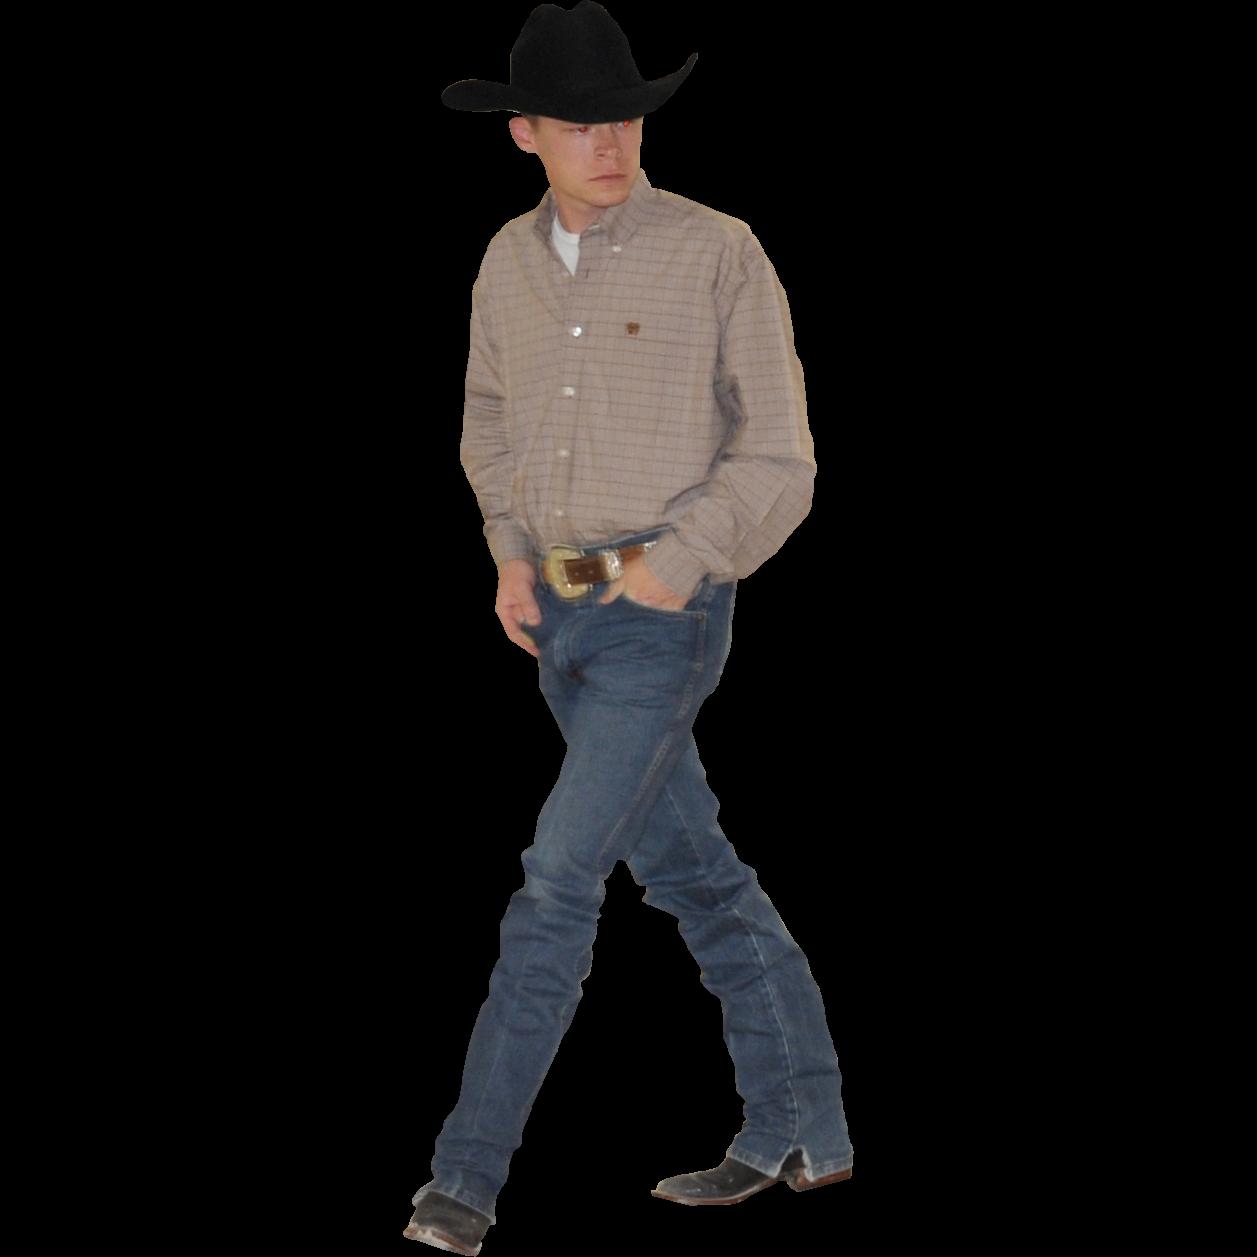 Cowboy PNG Image.